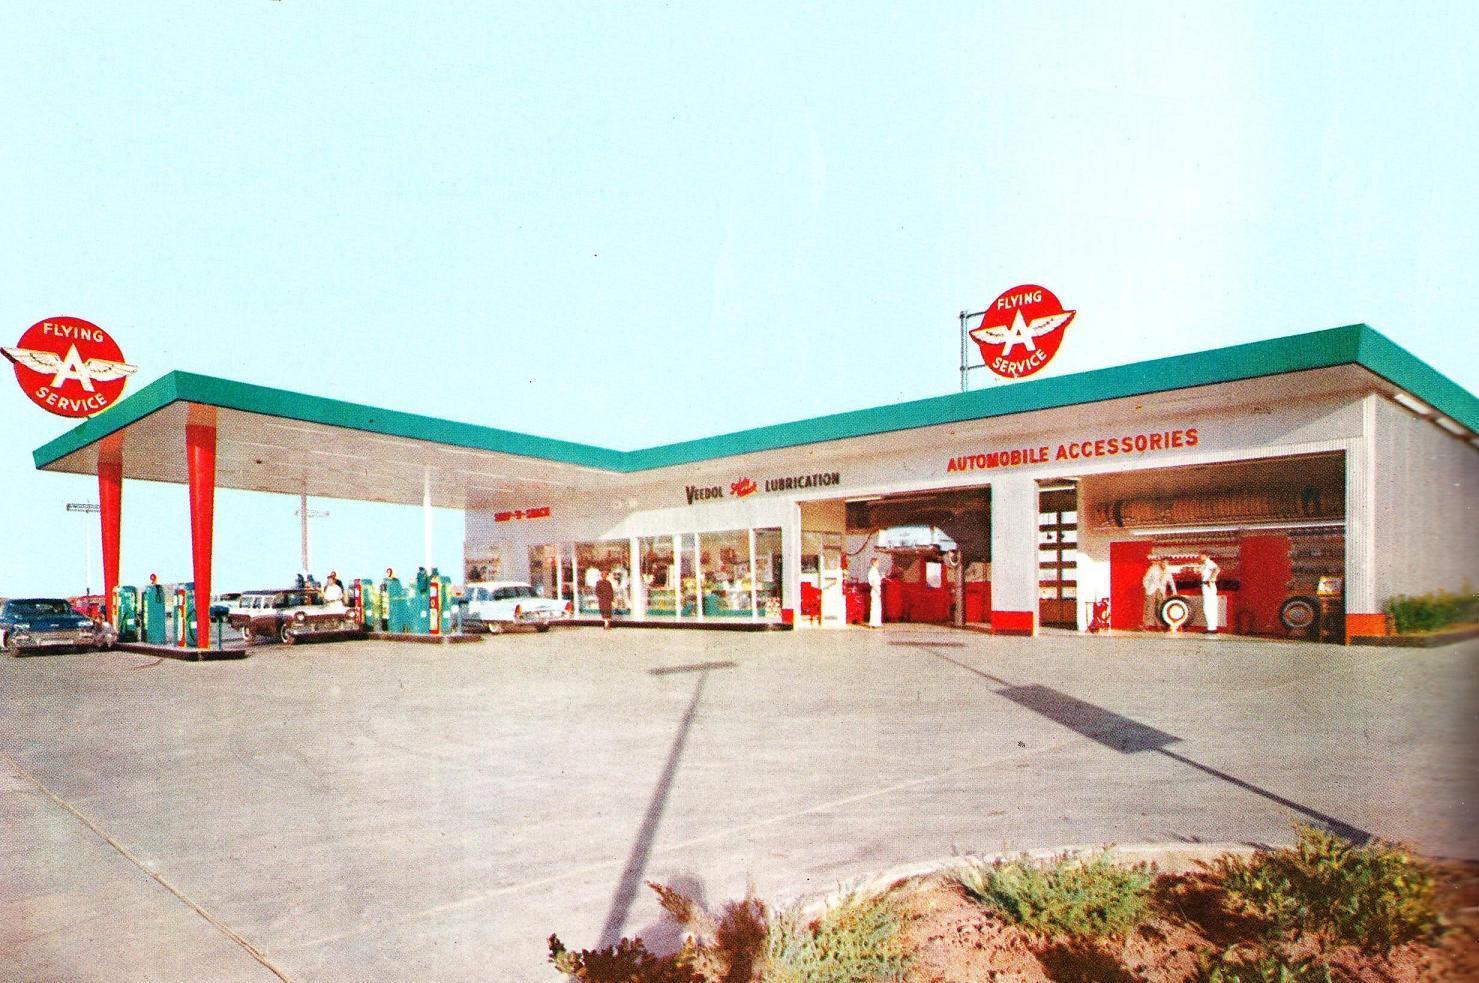 1940 Co-Op Gas Station PHOTO California Vintage Store Eagle Gasoline Pumps